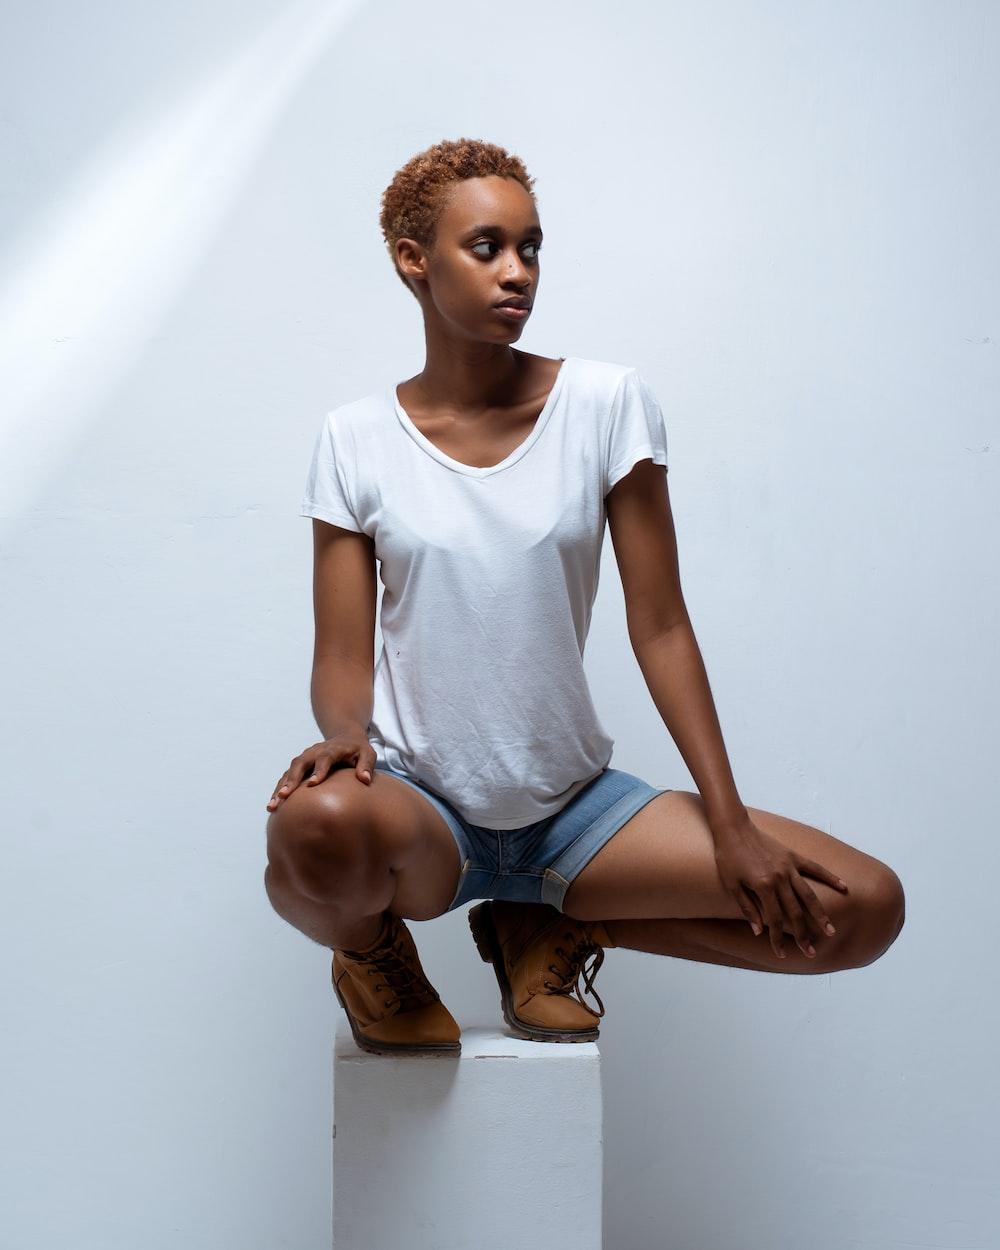 girl in white crew neck t-shirt and blue denim shorts sitting on floor